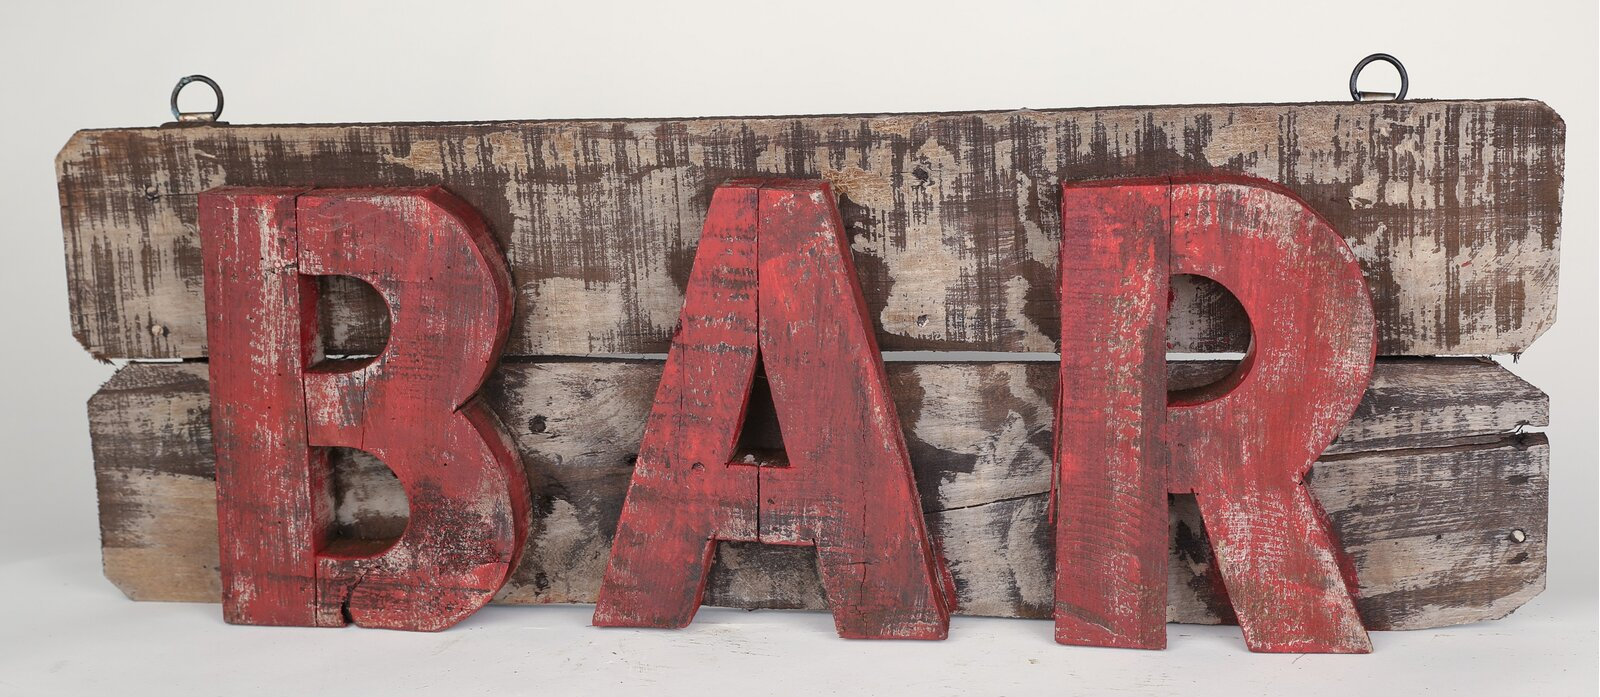 Industrial Wall Decor - Rustic Wooden BAR Sign Wall Decor